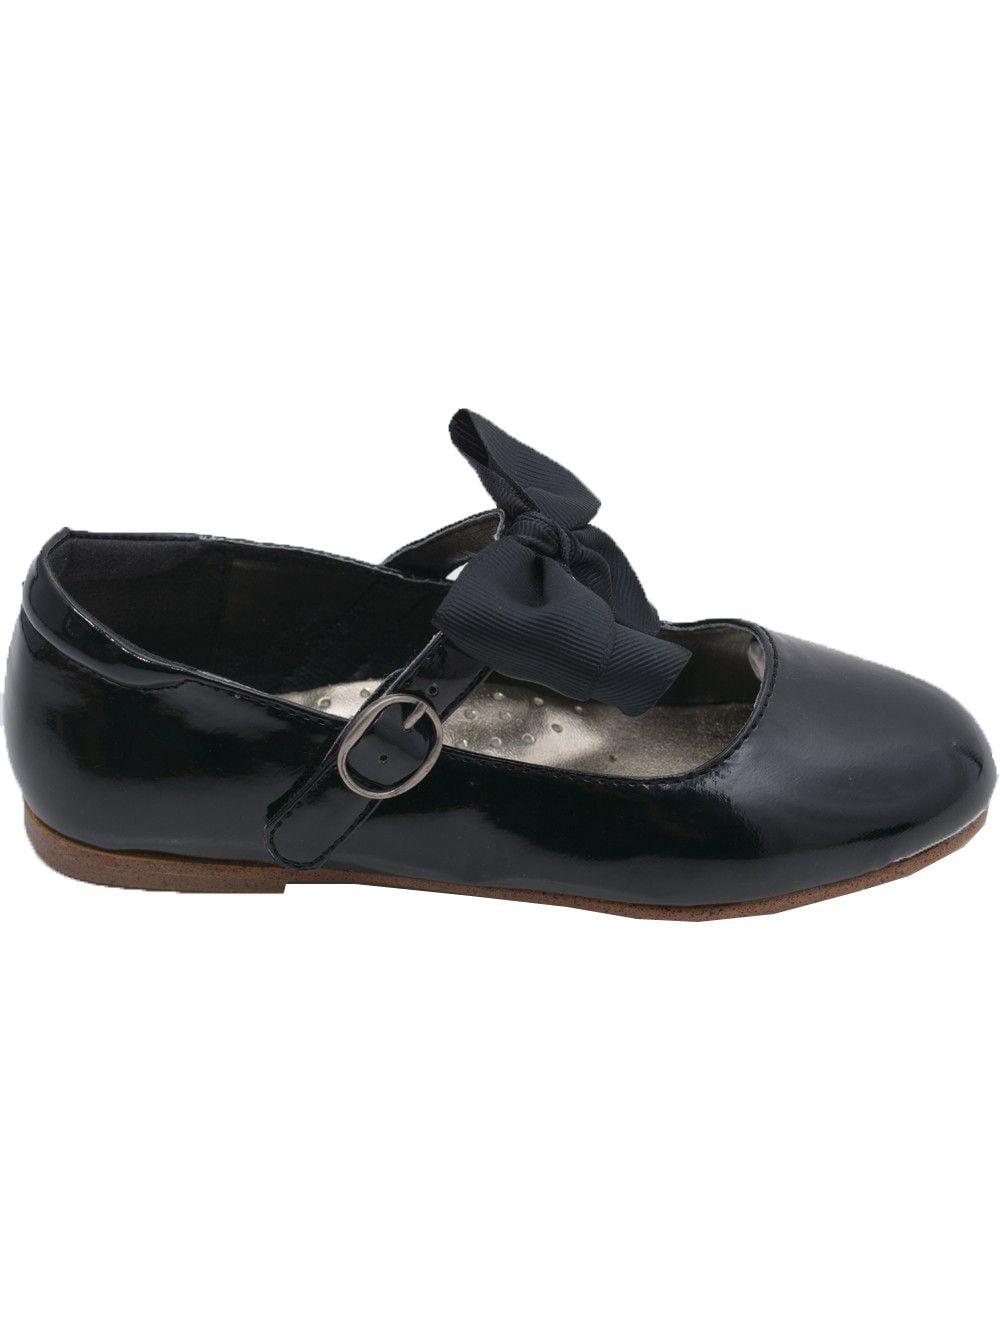 L'Amour Little Girls Black Grosgrain Bow Flats Dress Shoes 11-4 Kids